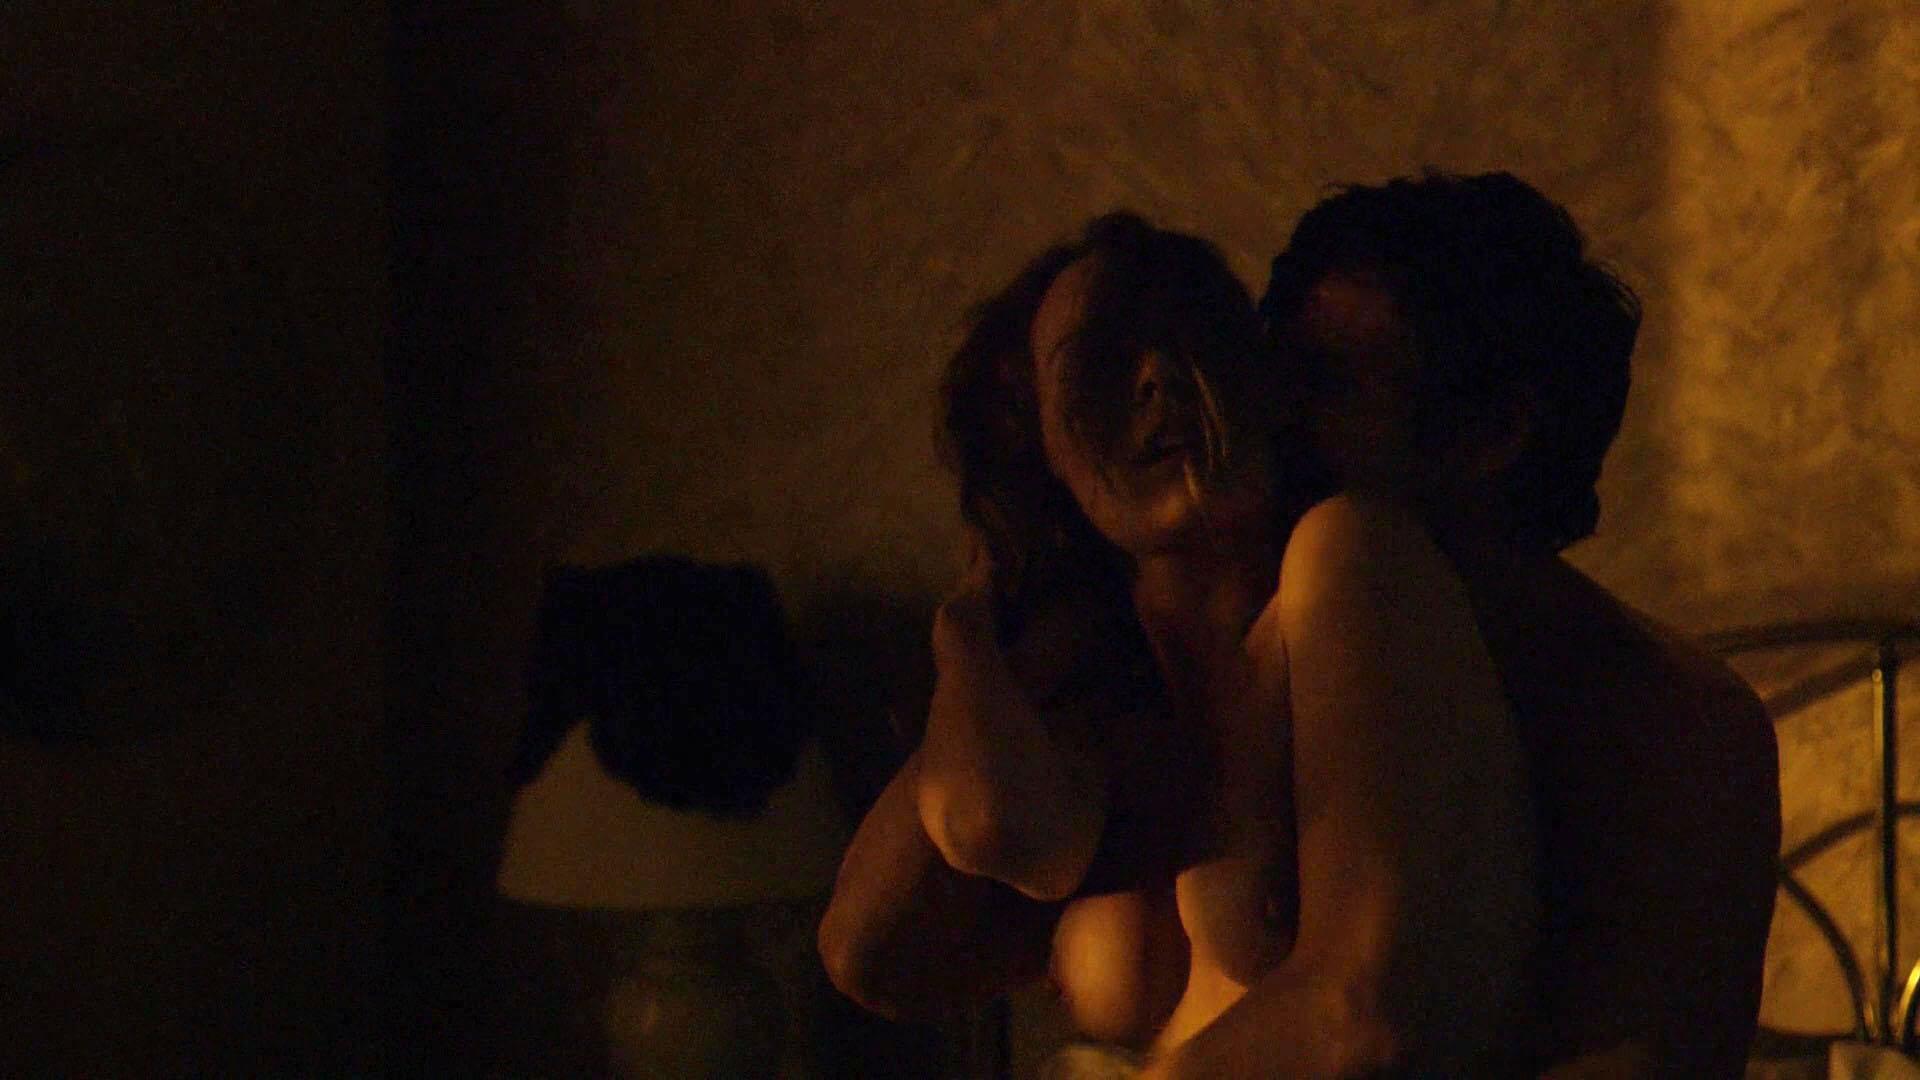 Carolina acevedo topless new photo